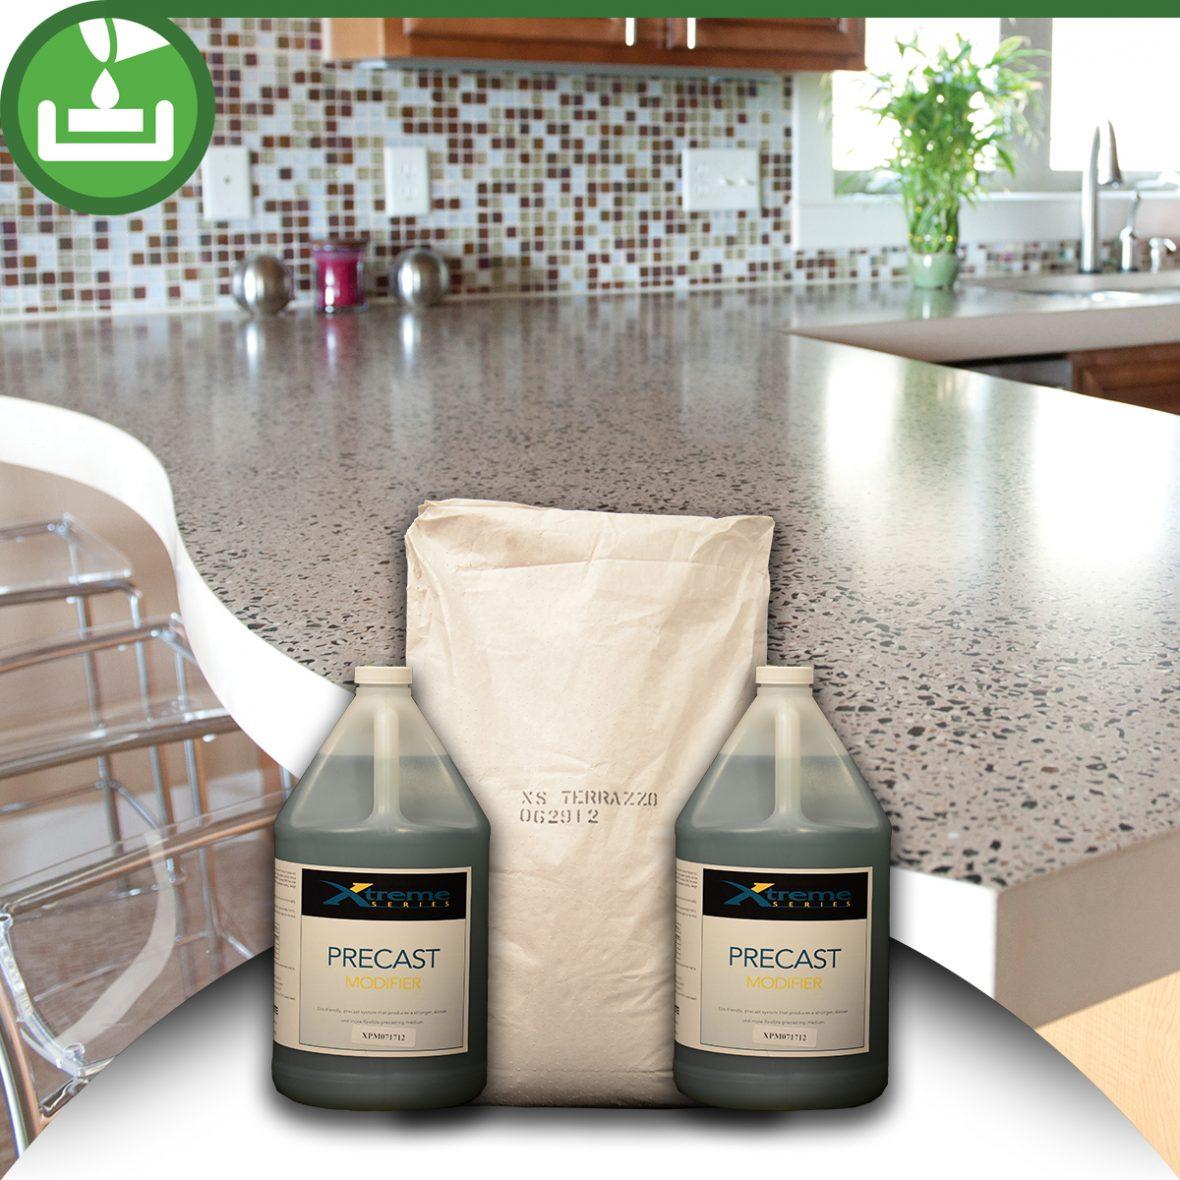 concrete countertop casting mix kit bdc supply company